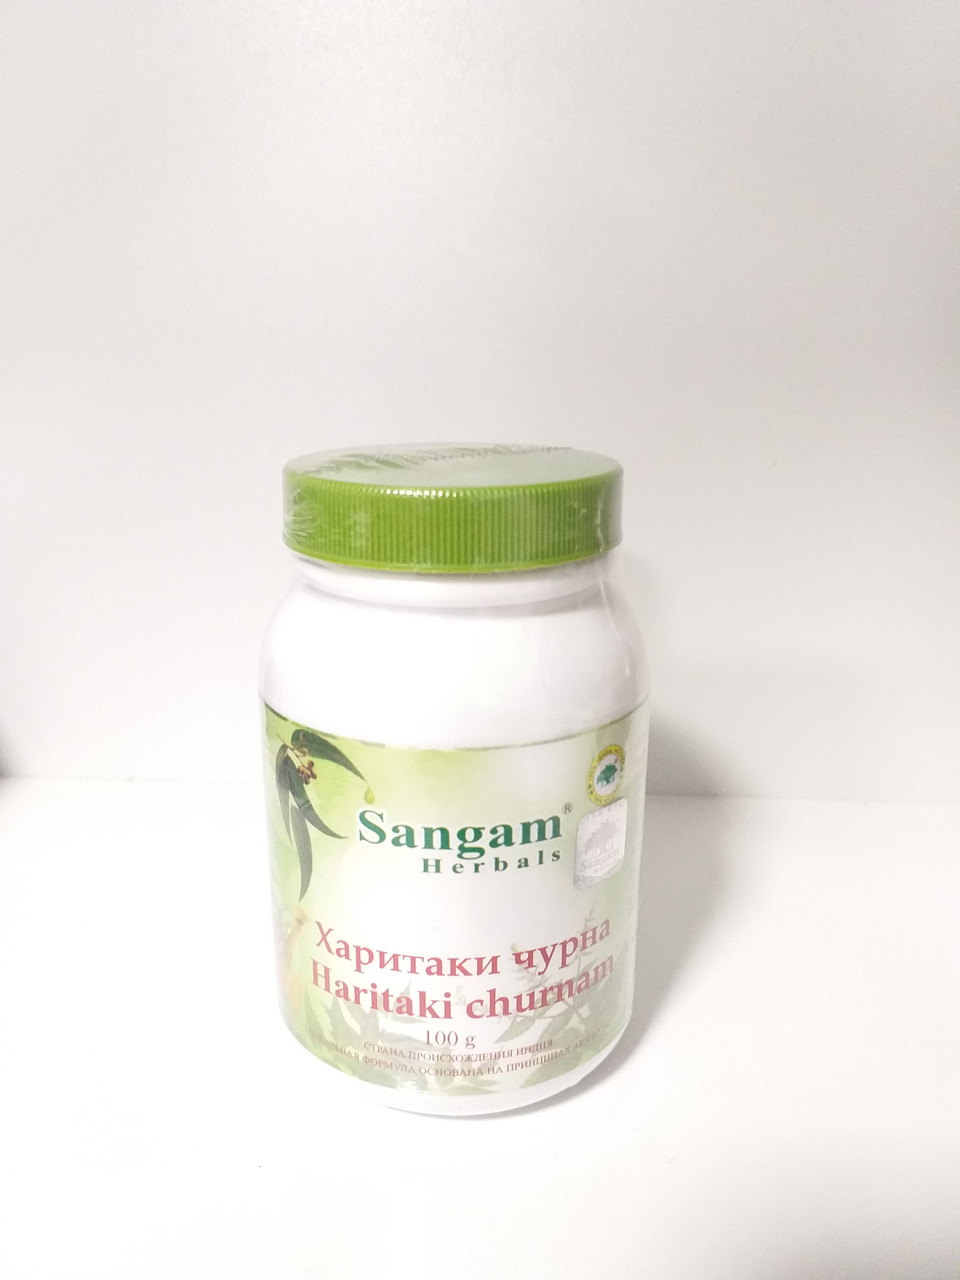 Харитаки чурна, Haritaki churnam, 100 гр, Сангам, Sangam Herbals